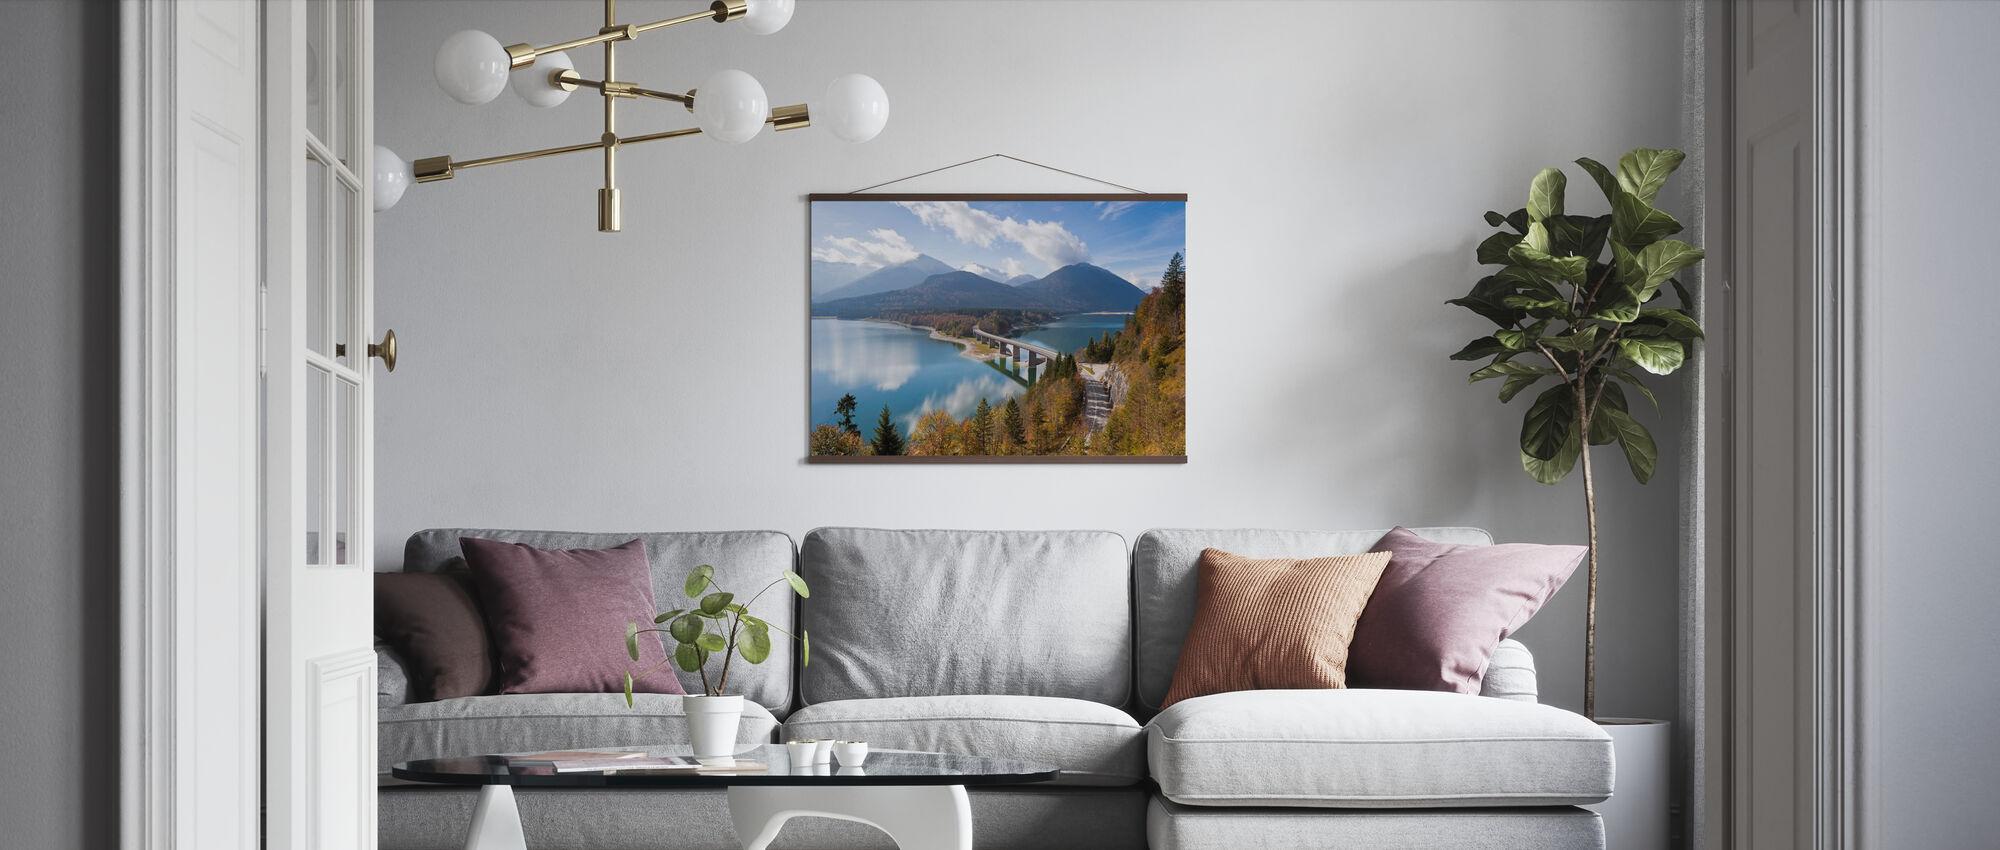 Baviera - Poster - Salotto